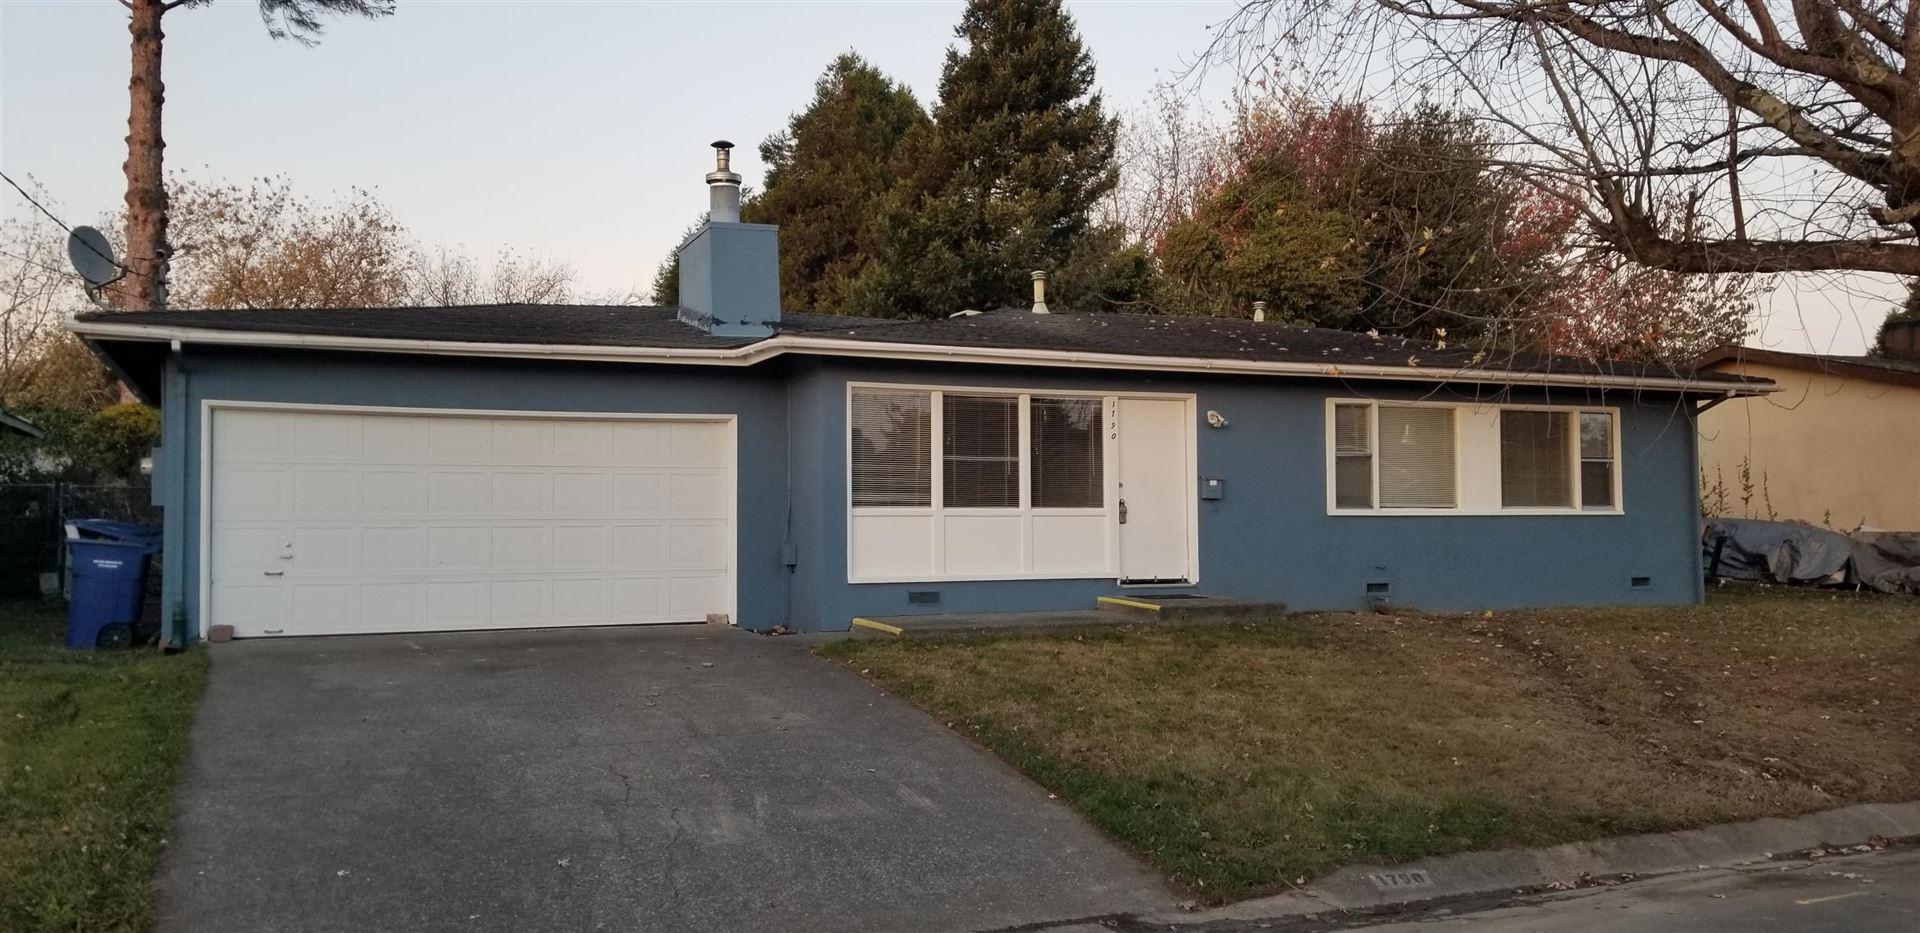 1790 Stewart Avenue, Arcata, CA 95521 - MLS#: 257888